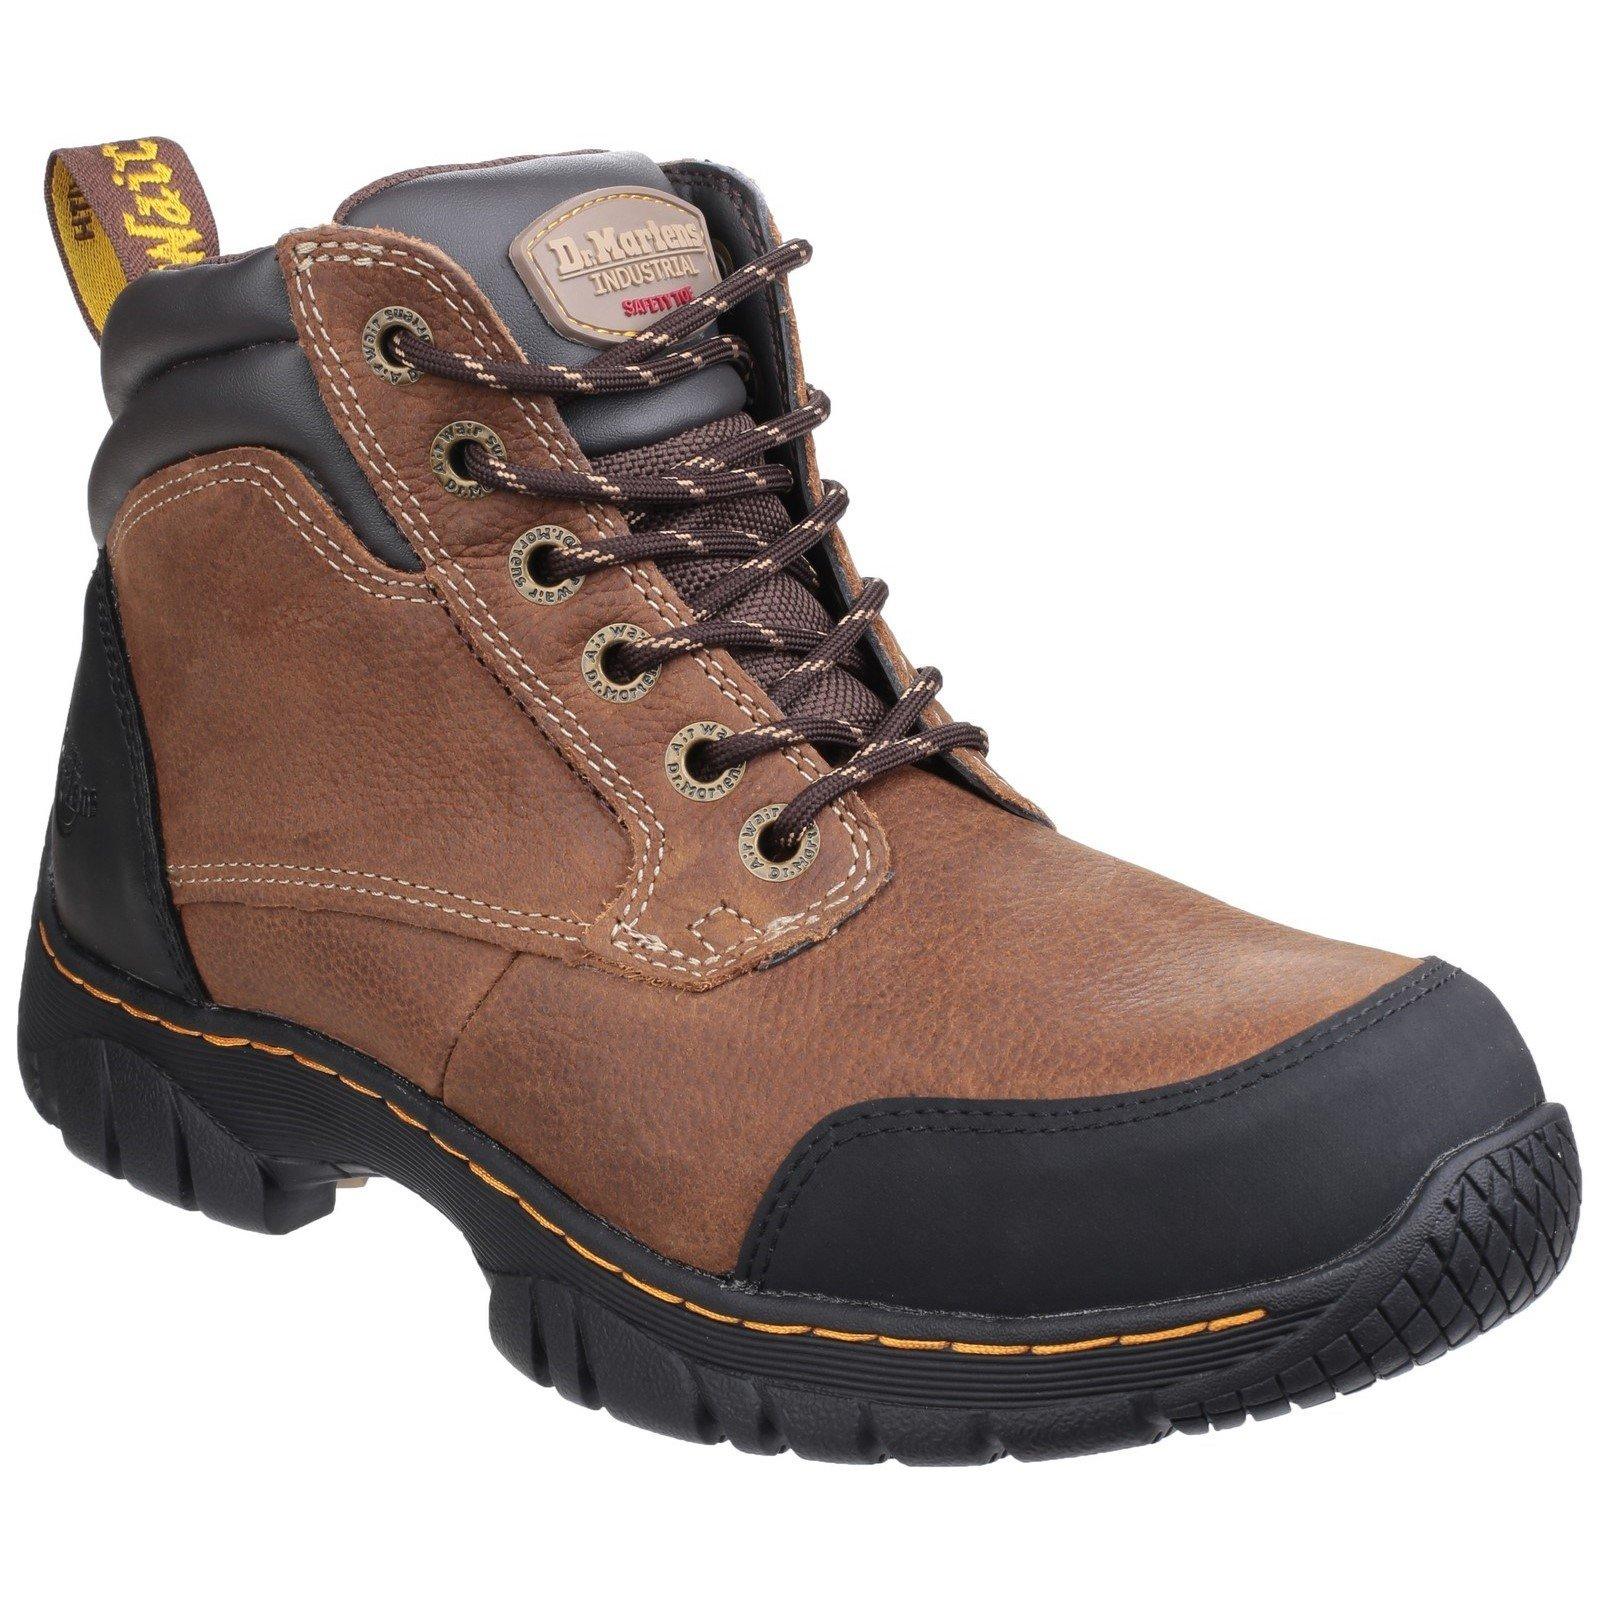 Dr Martens Unisex Riverton SB Lace up Hiker Safety Boot 24534 - Brown 5